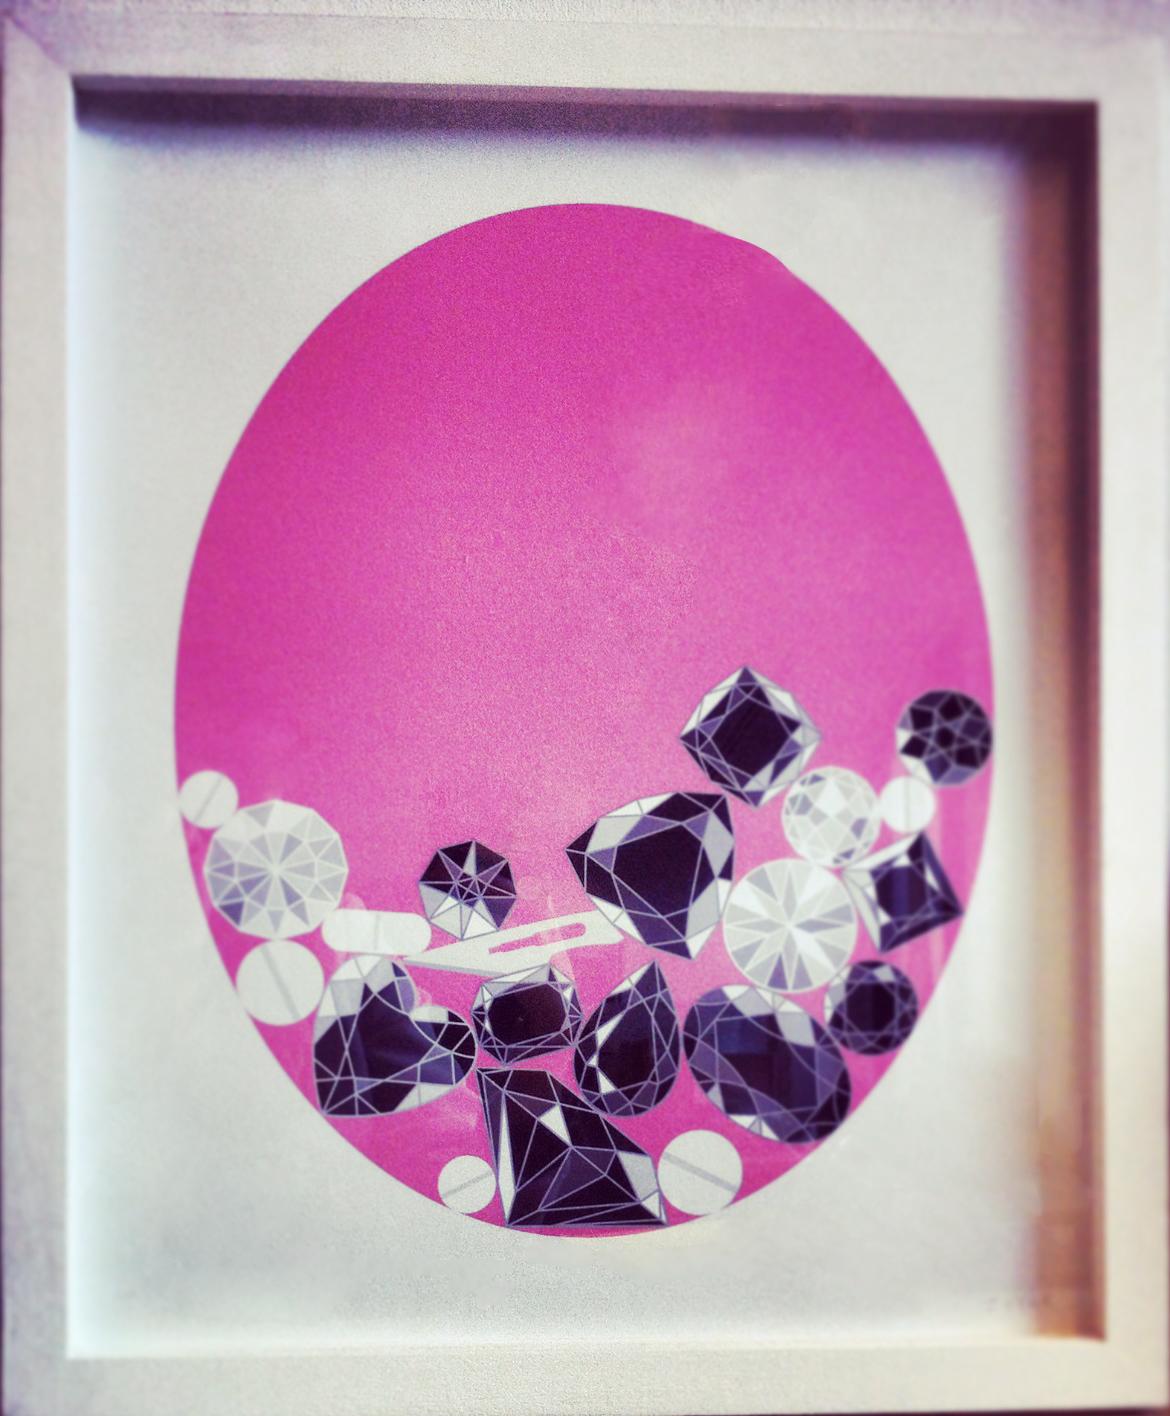 Easter egg by James Joyce